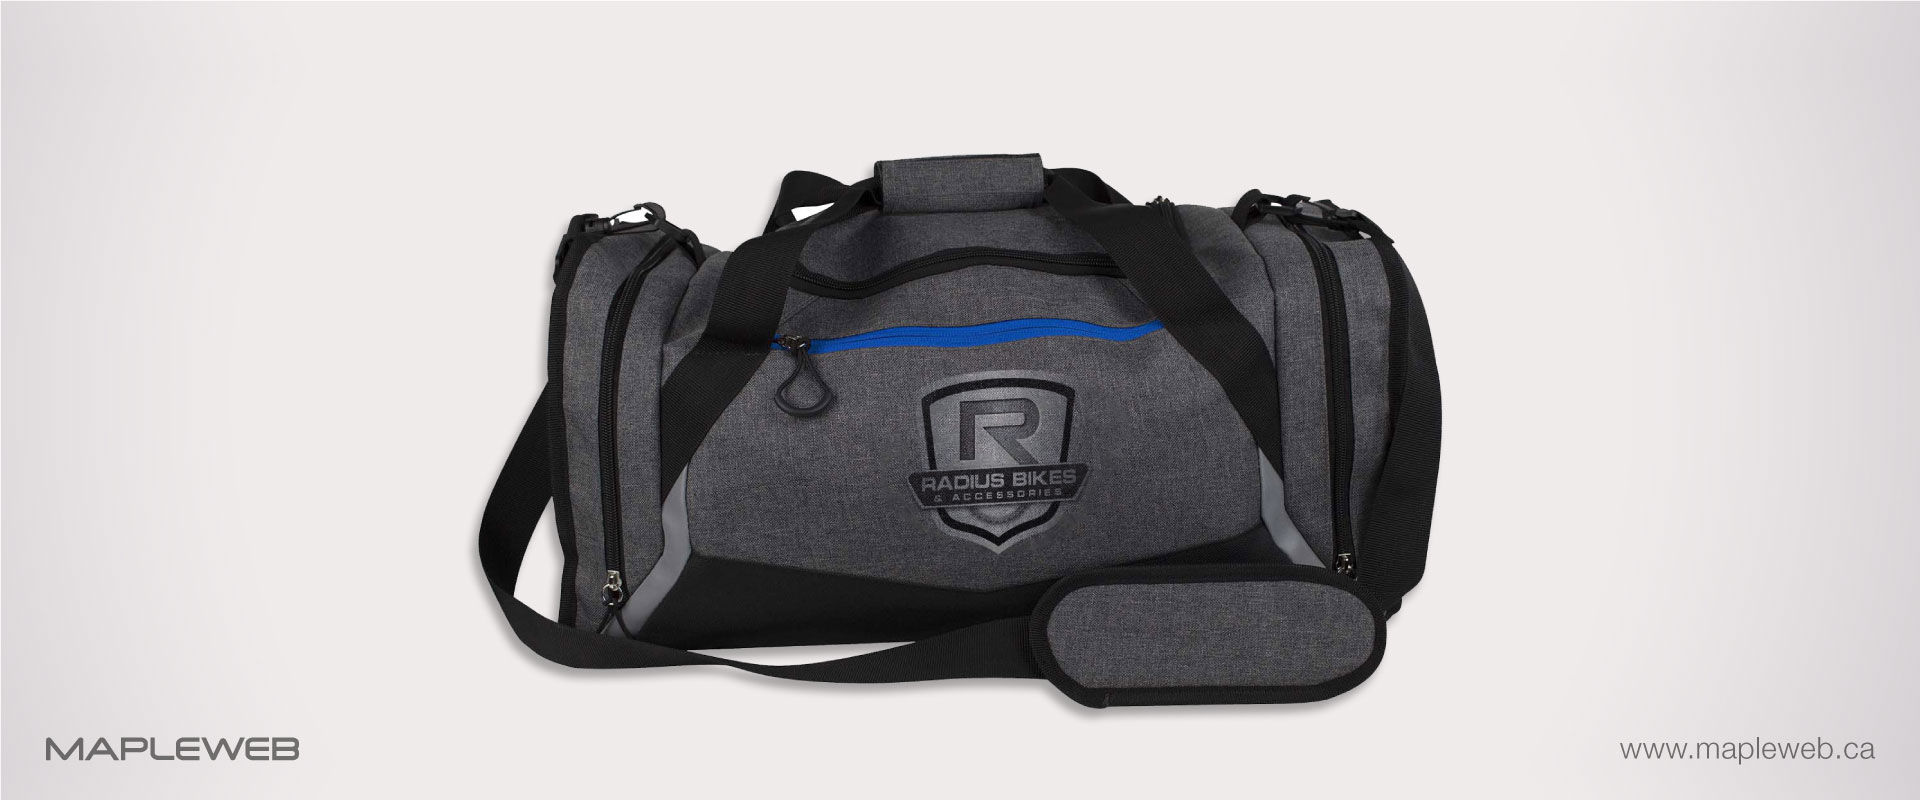 radius-bikes-brand-logo-design-by-mapleweb-vancouver-canada-bag-mock